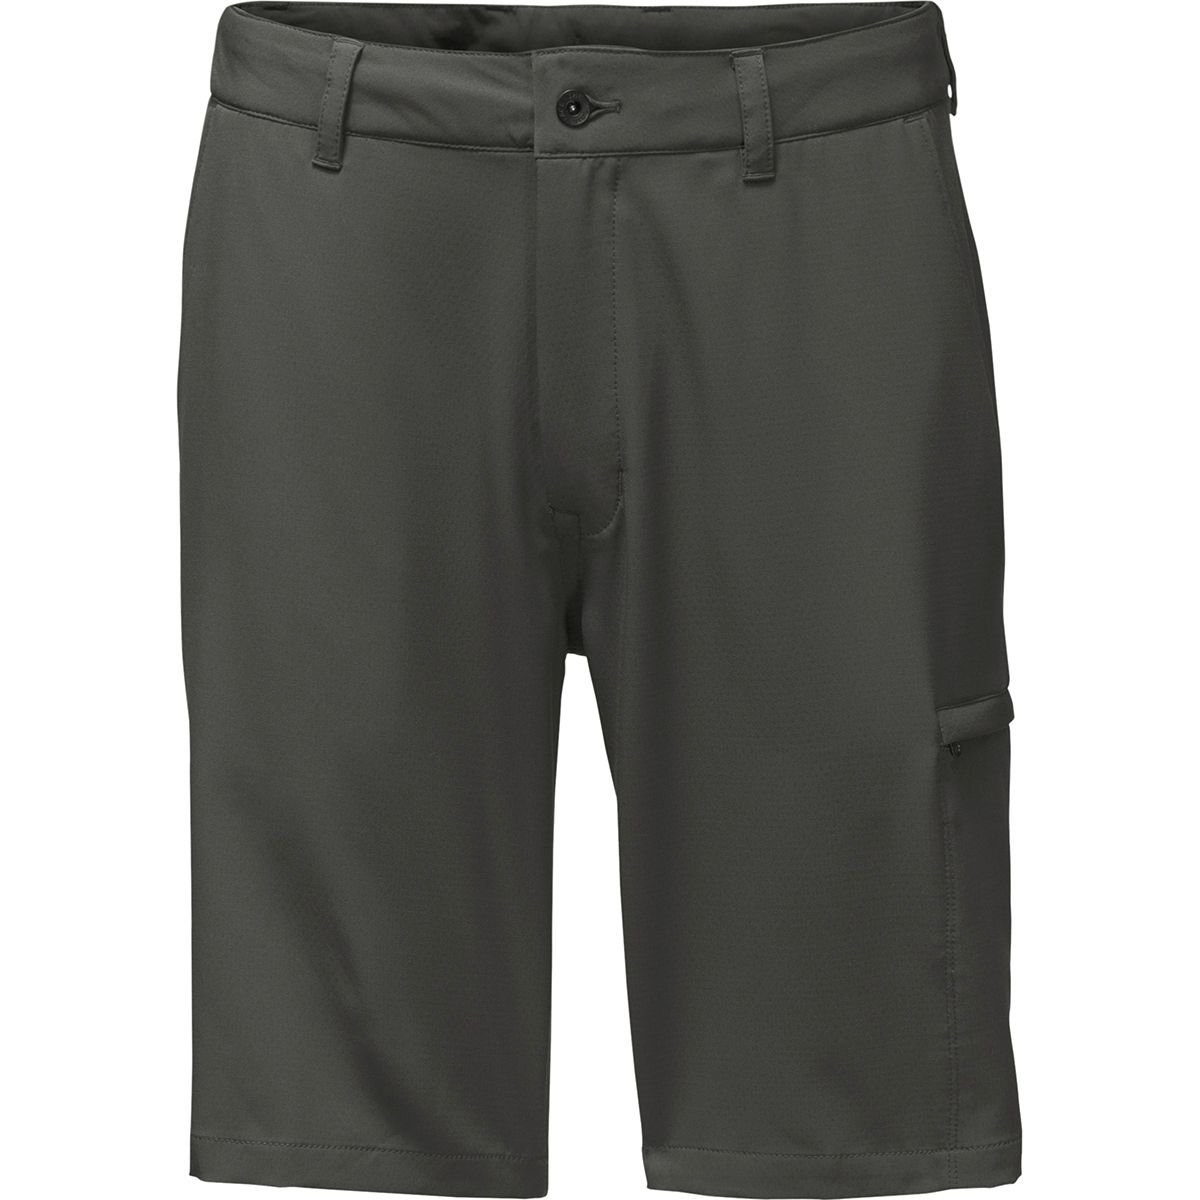 The North Face SHORTS メンズ B0792KNQJQ 35|グレー(Asphalt Grey) グレー(Asphalt Grey) 35